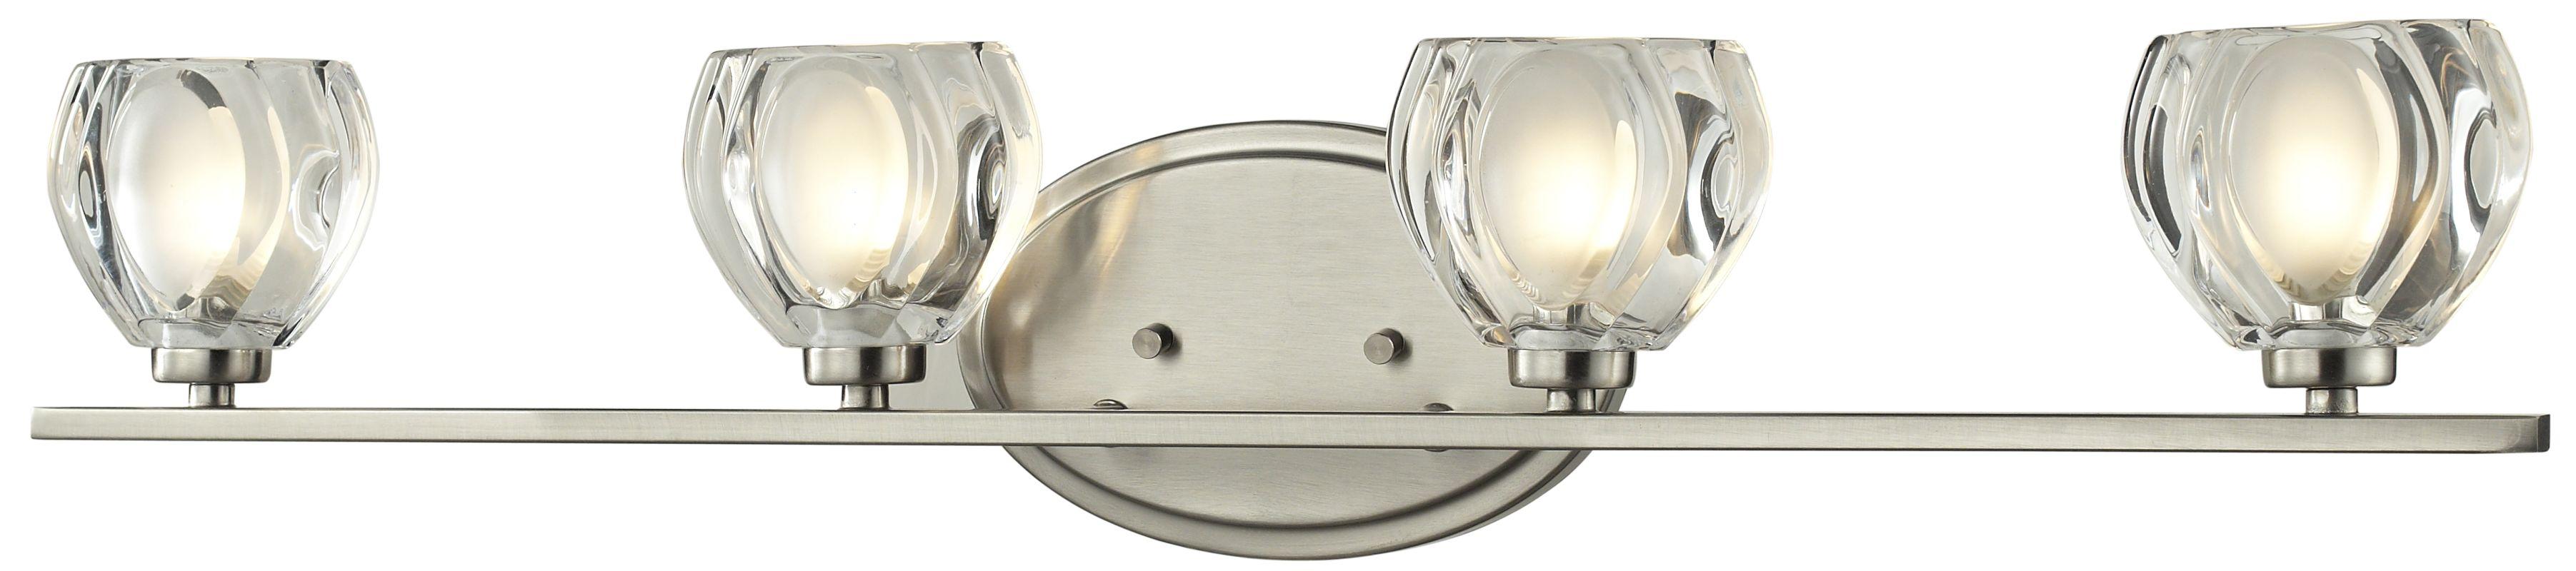 Z-Lite 3022-4V Hale 4 Light ADA Compliant Bathroom Vanity Light with